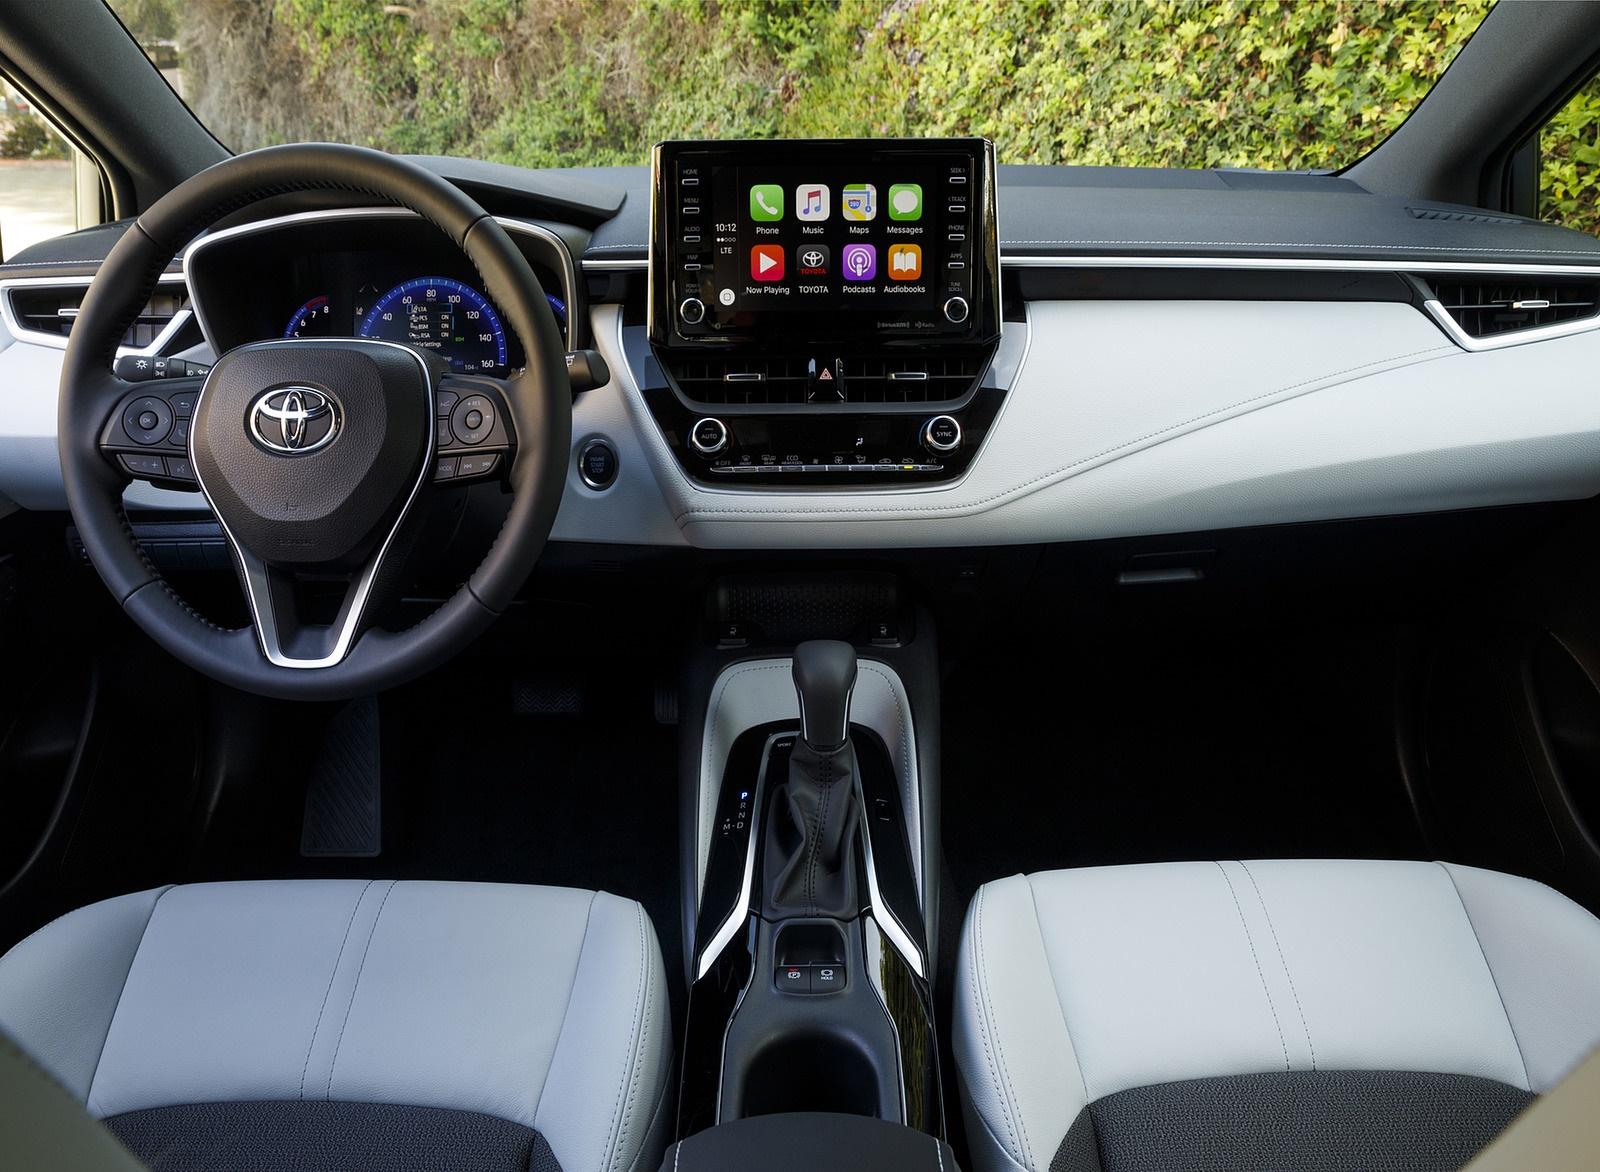 2019 Toyota Corolla Hatchback Interior Cockpit Wallpapers #48 of 75